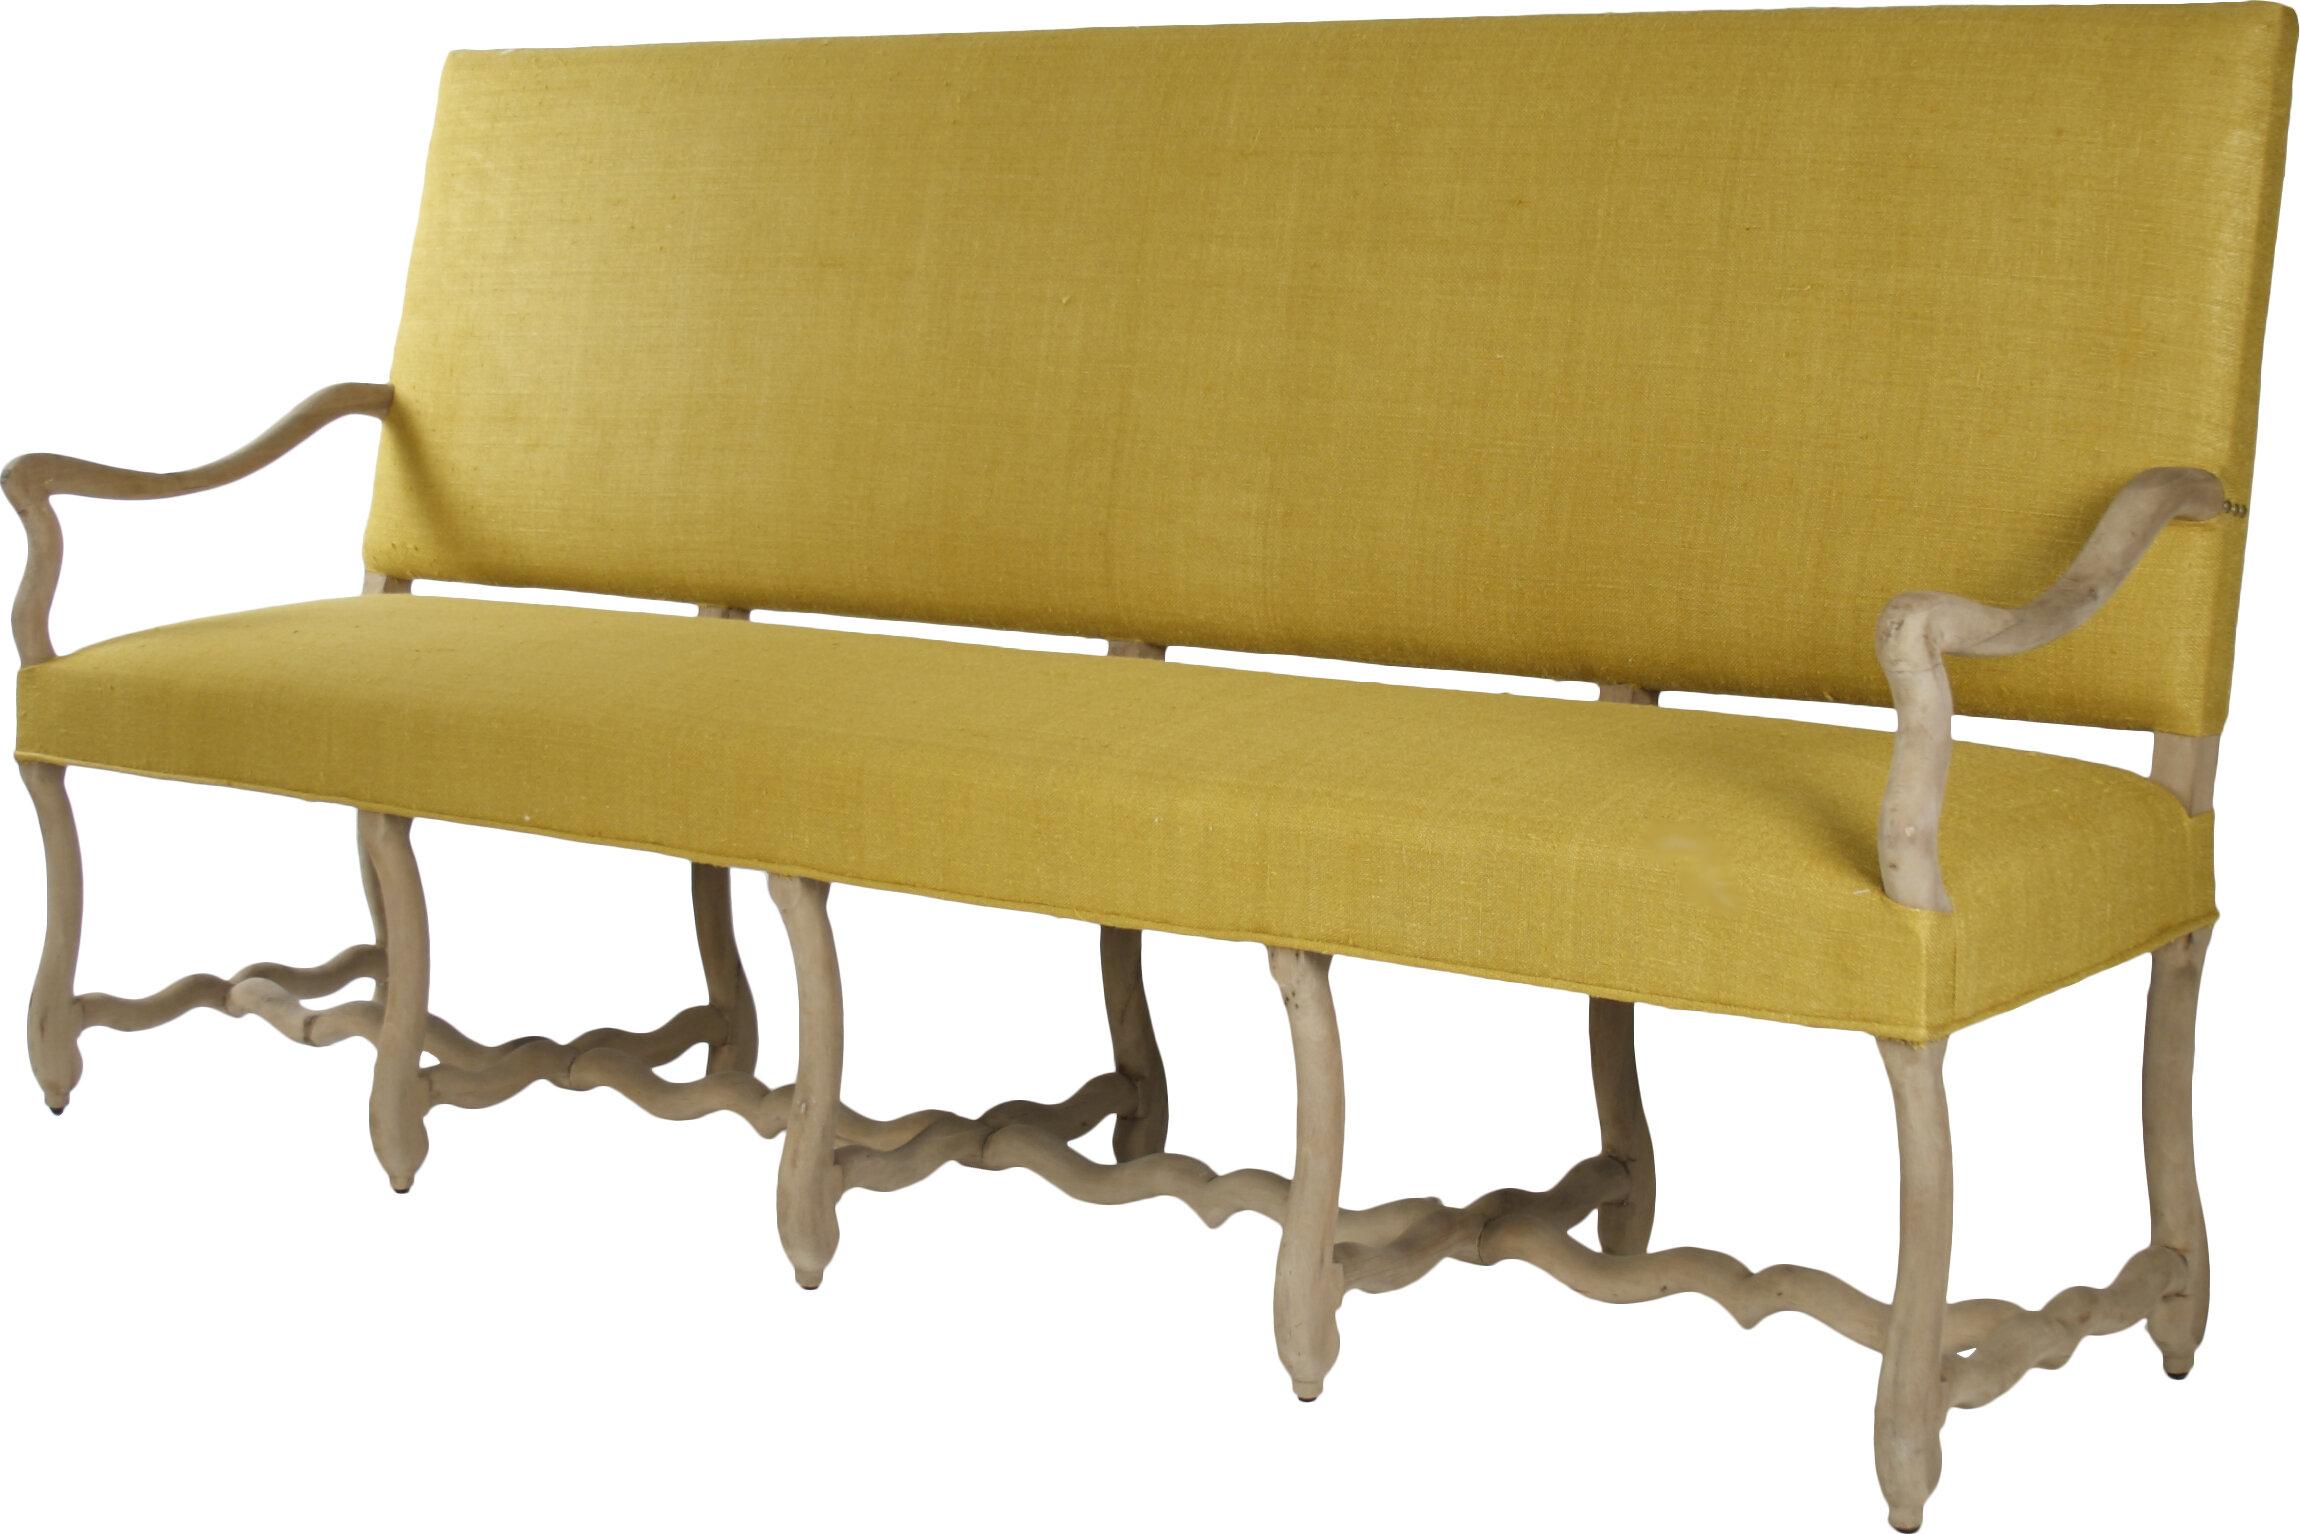 Veronike Silk Fabric Bench By Zentique